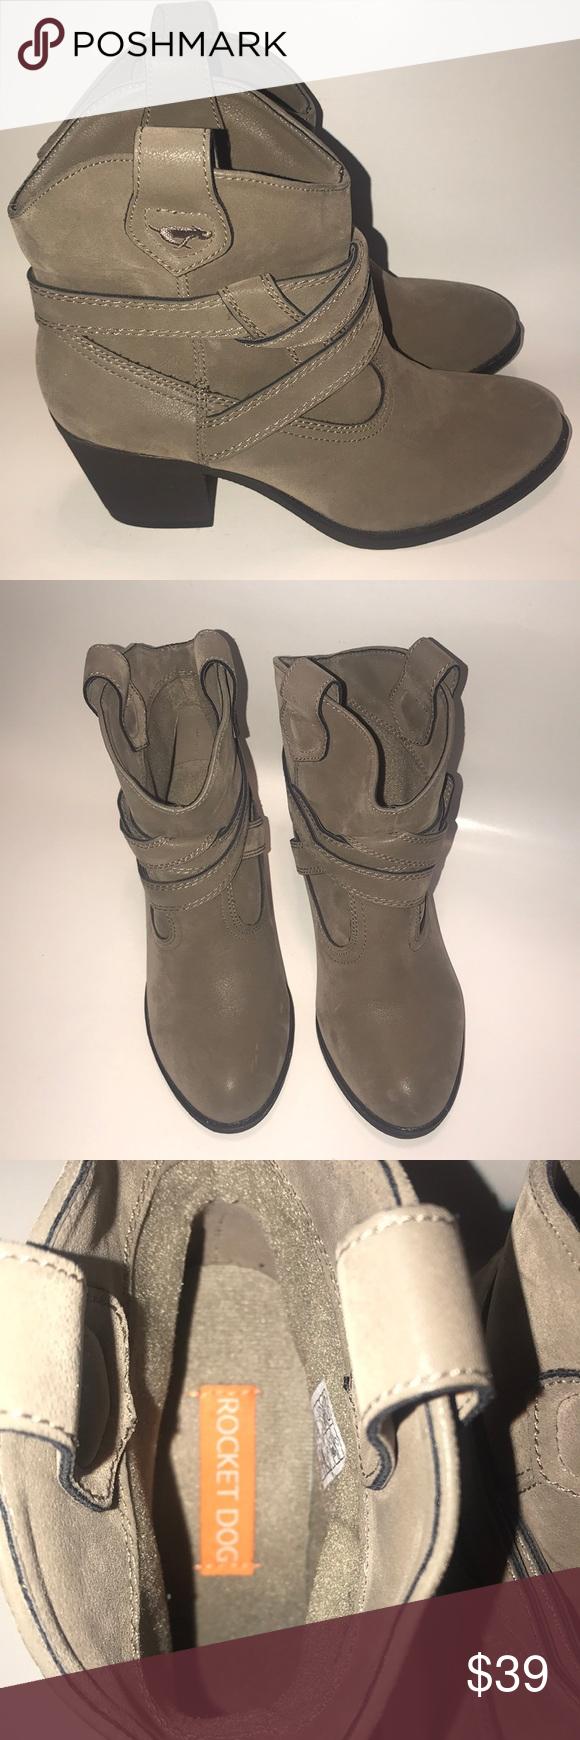 601904f2f9c Rocket Dog Women's boots color olive tan size 7 Rocket Dog Women's ...